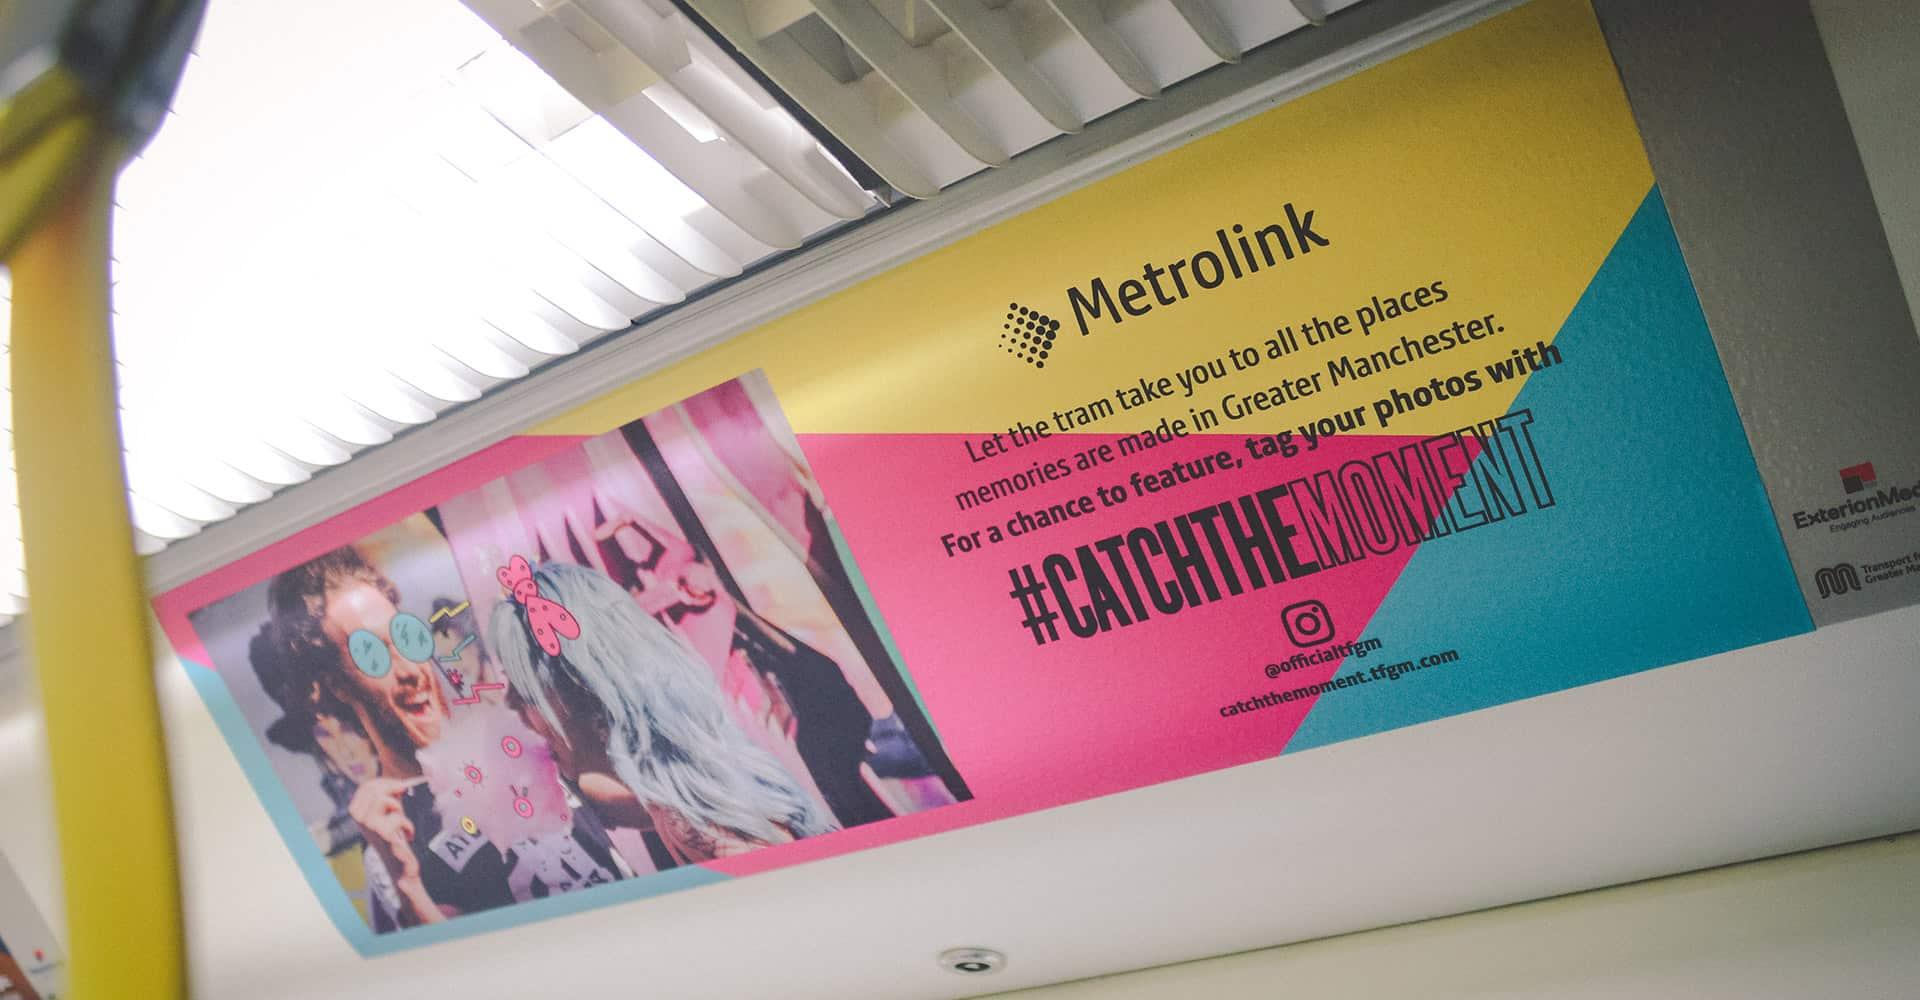 campaign, summer, metrolink, advertising